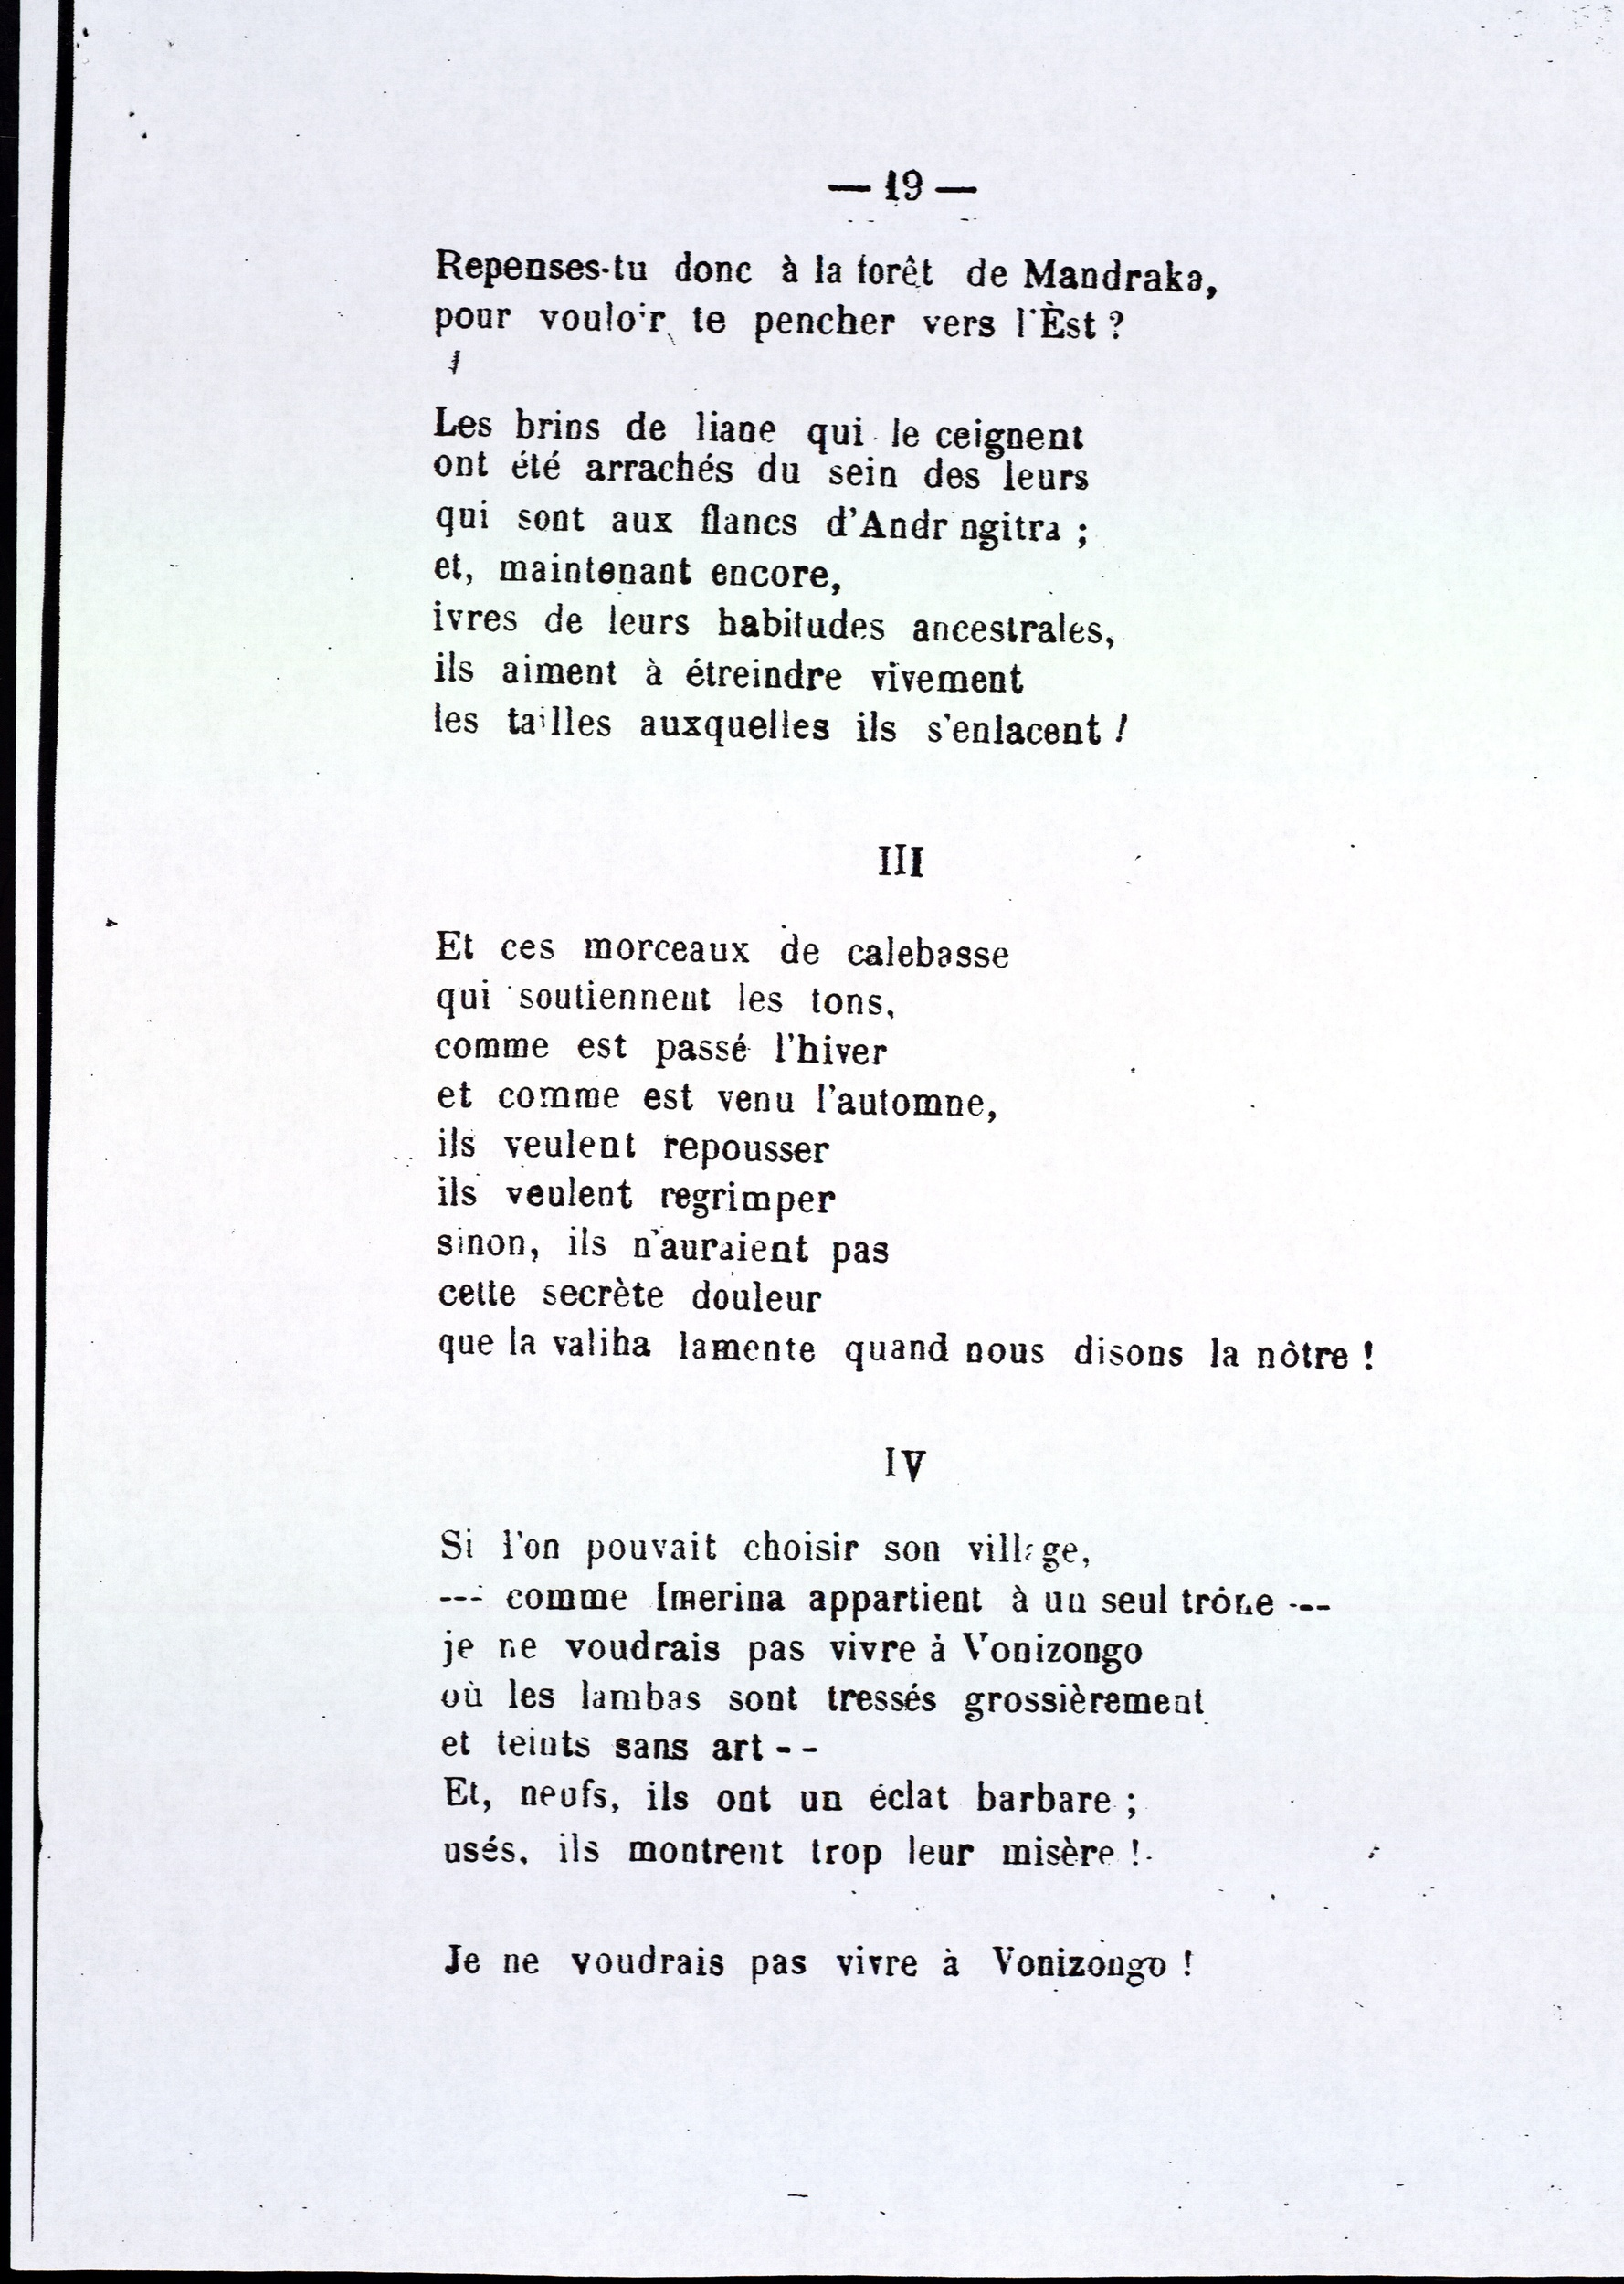 ETU REV 18LS Vieilles chansons 2.jpg